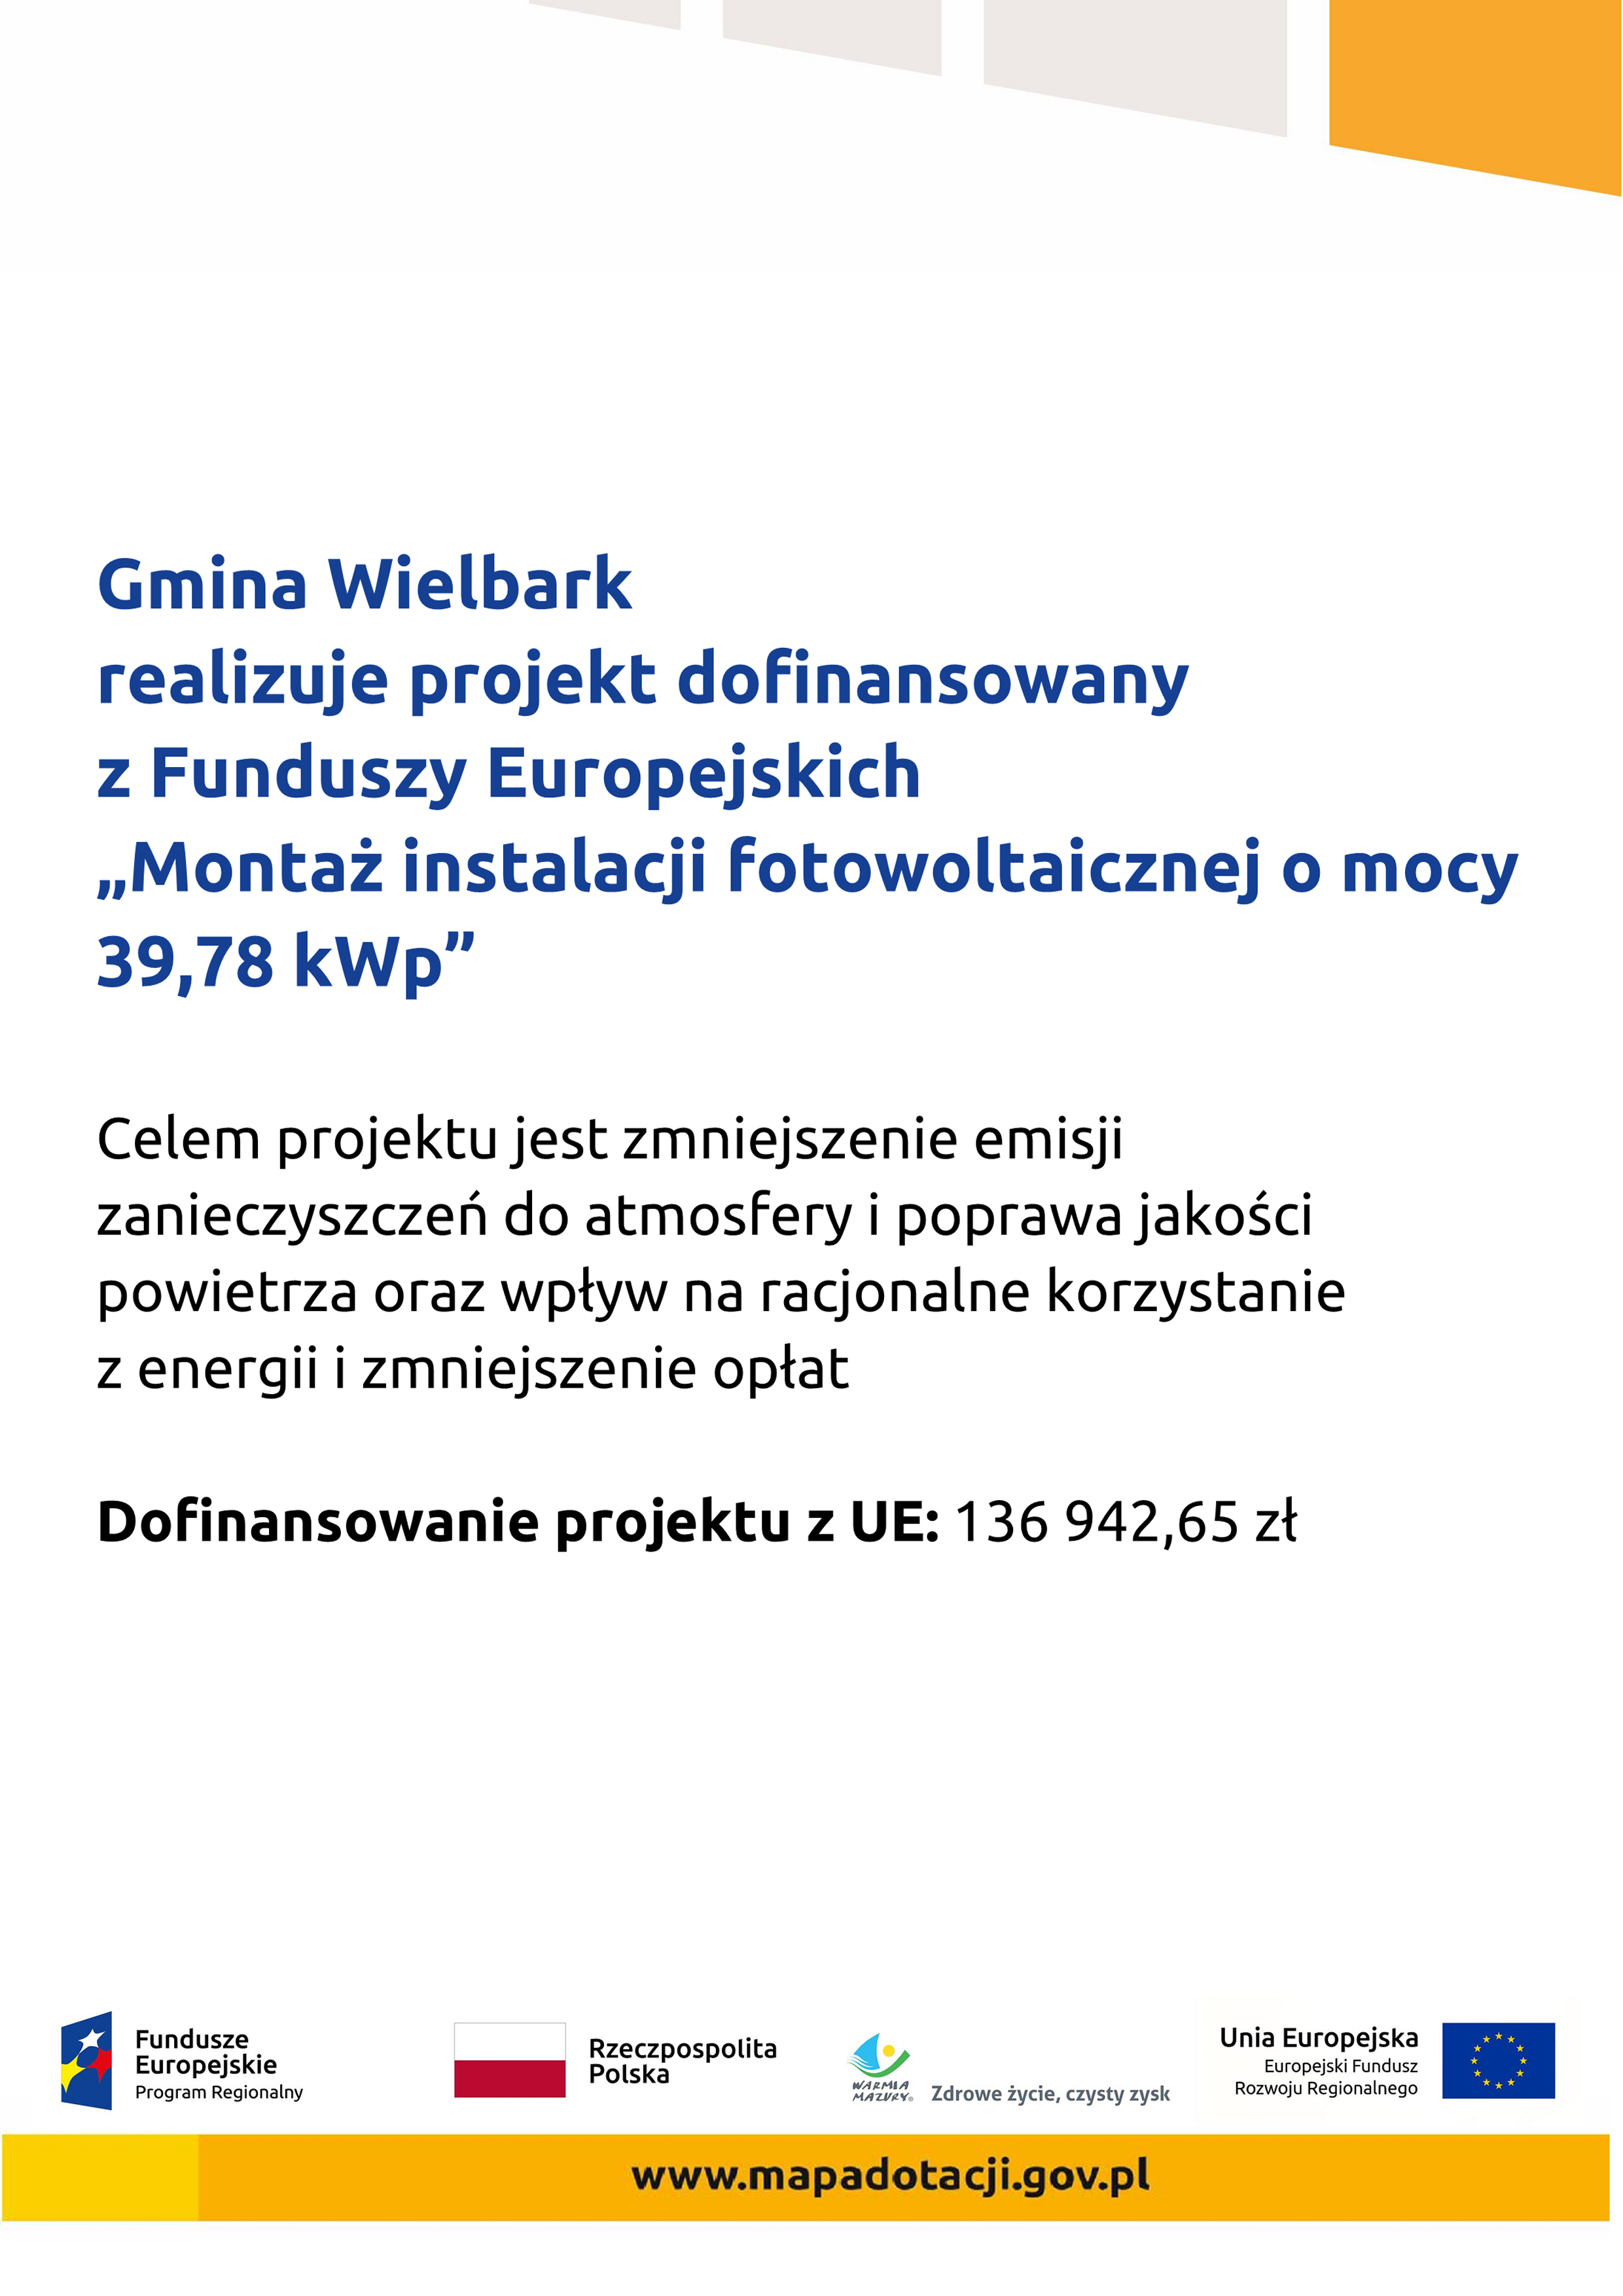 https://m.powiatszczycienski.pl/2018/12/orig/foto-v2-21005.jpg